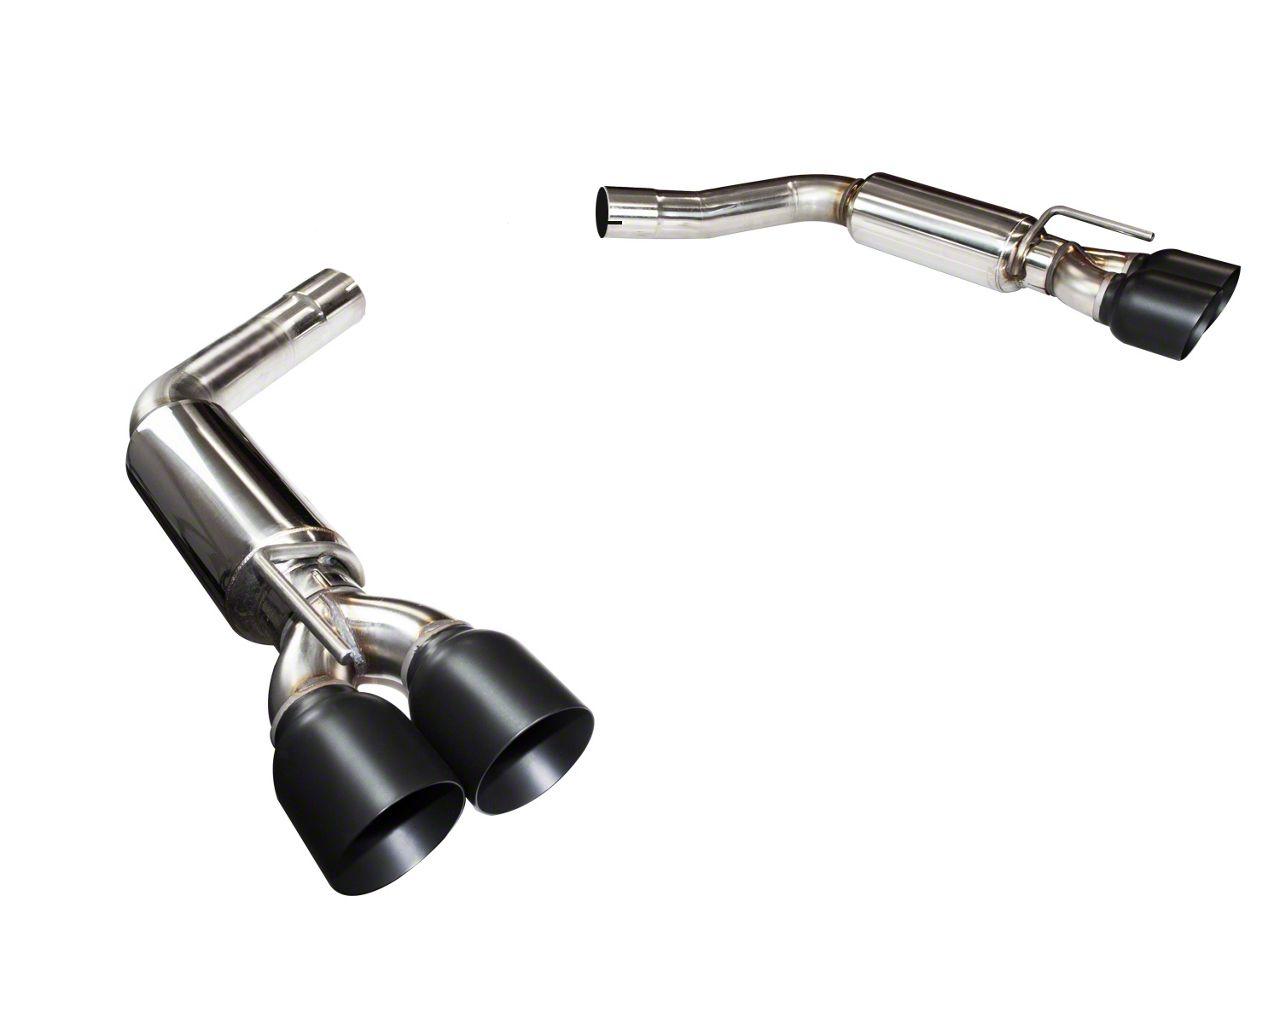 Kooks Axle-Back Exhaust w/ Black Tips (15-19 6.2L HEMI)